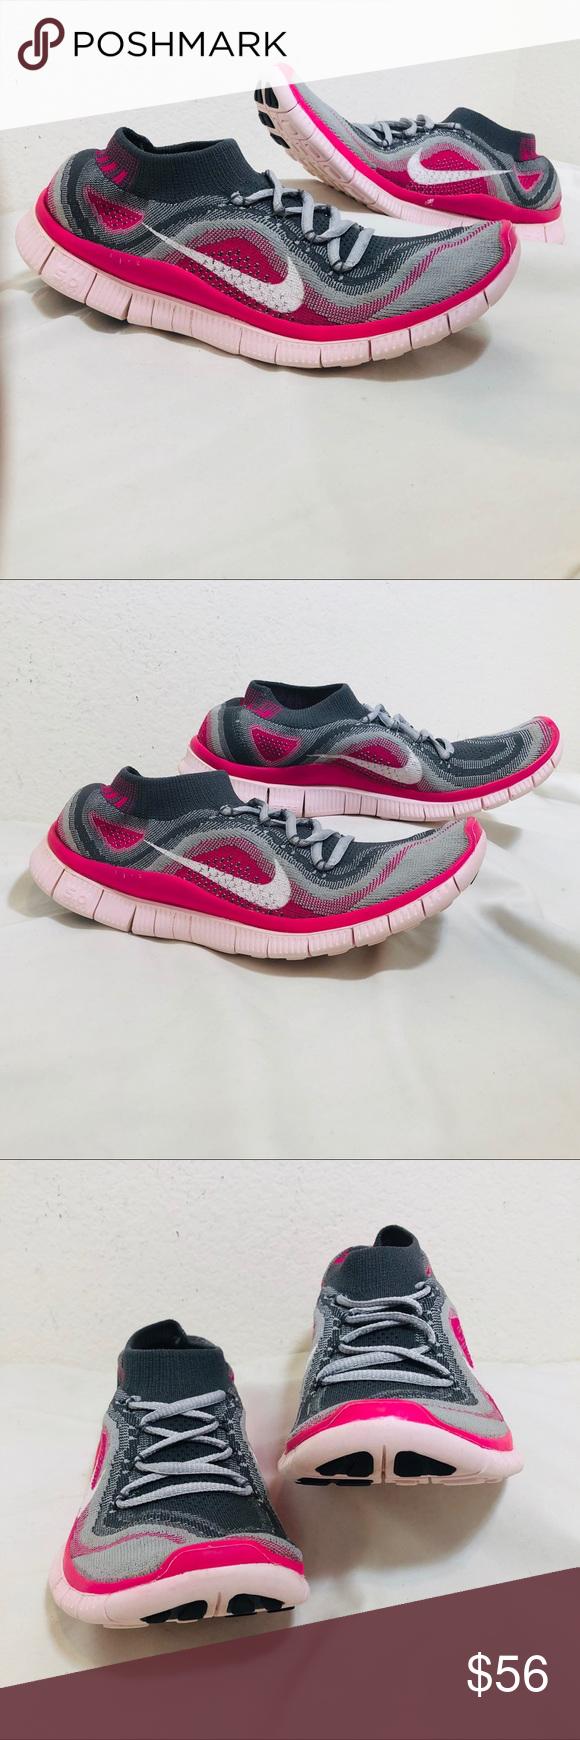 746adedbe49c Nike Free 5.0 Flyknit Women s Shoes Nike Free 5.0 Flyknit Size  10 Women s  Condition  preowned